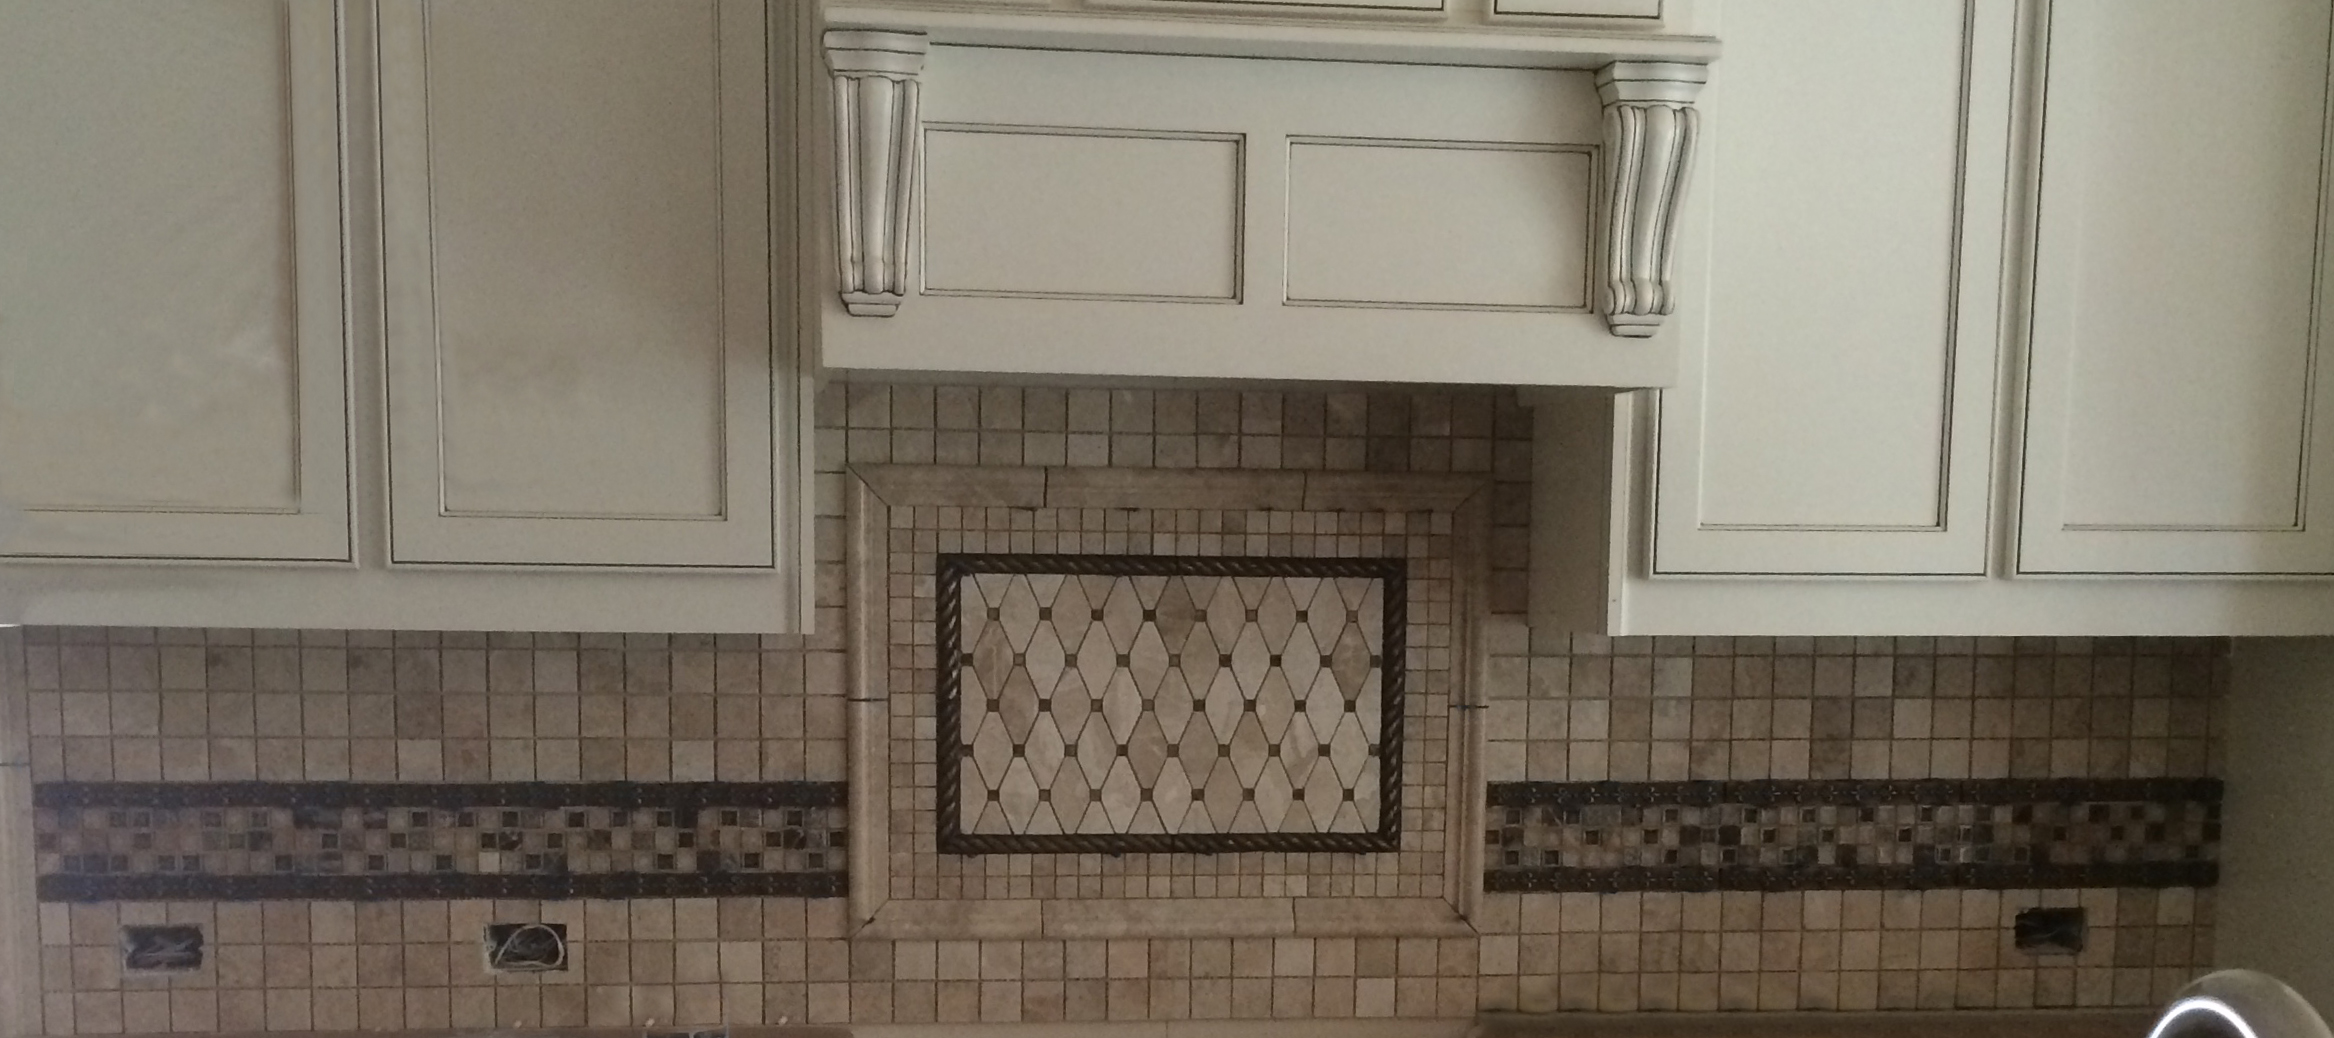 Kitchen Decorative Border & Accents